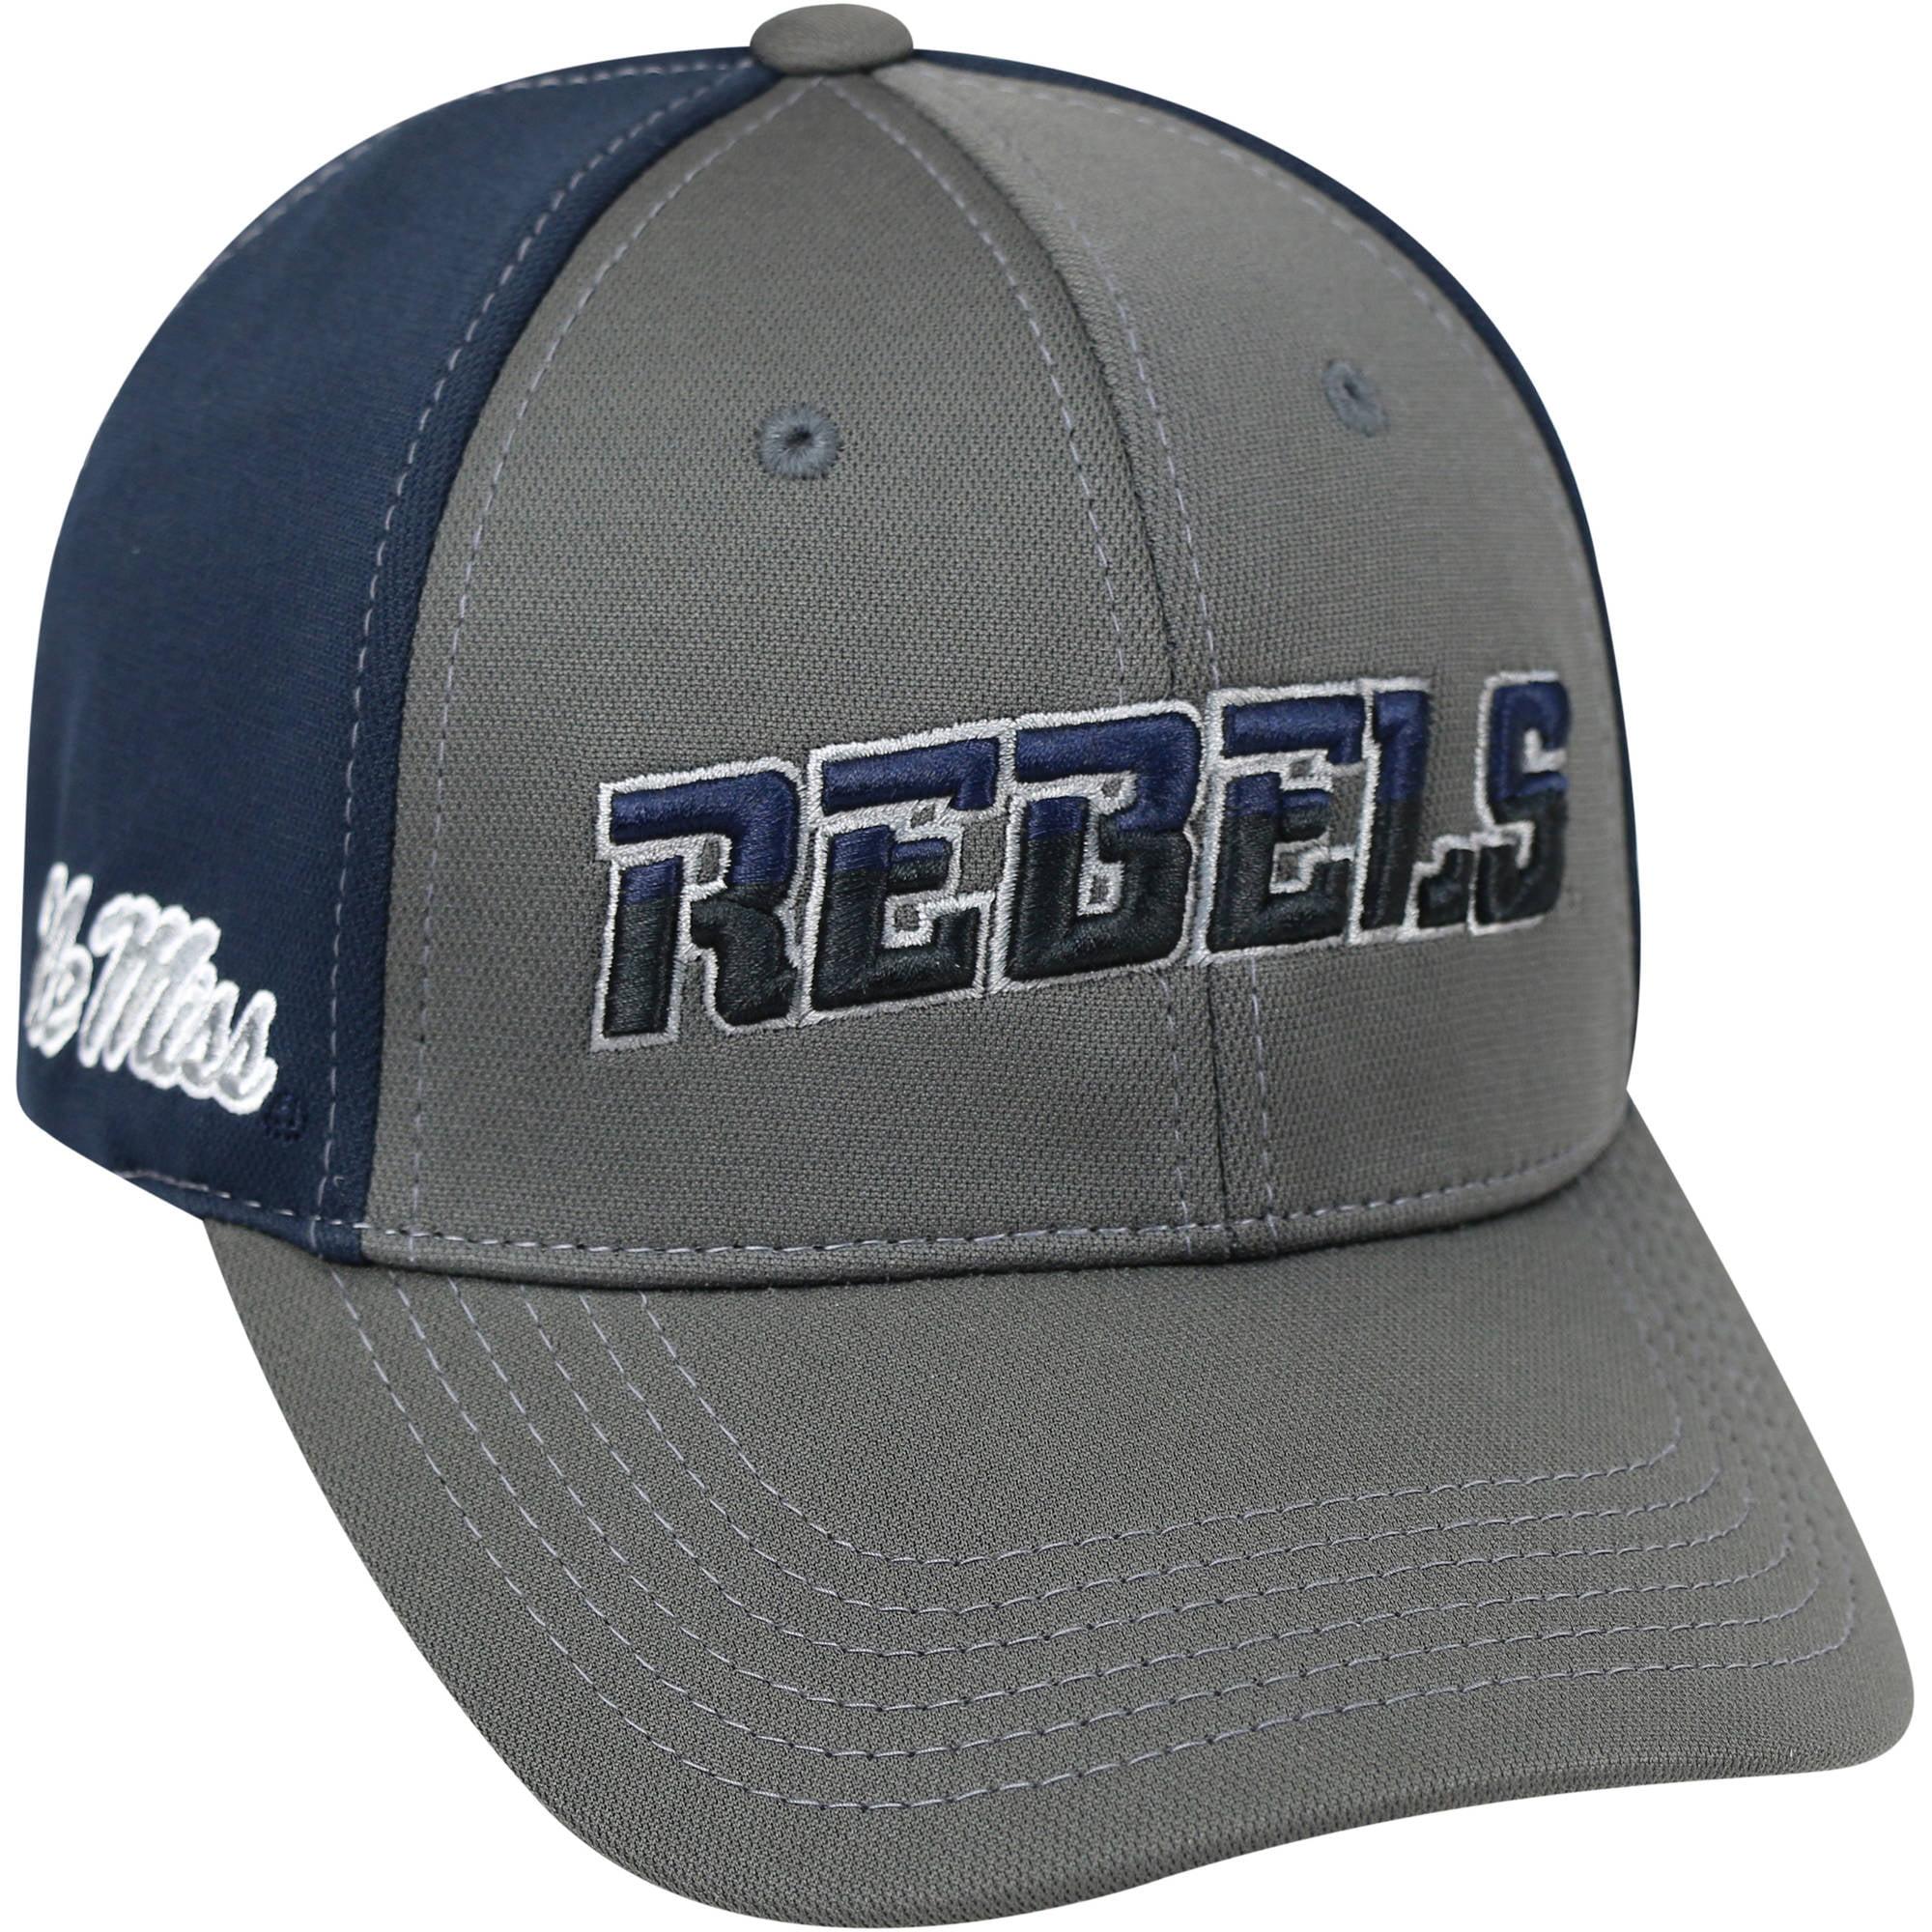 University Of Mississippi Rebels Grey Two Tone Baseball Cap